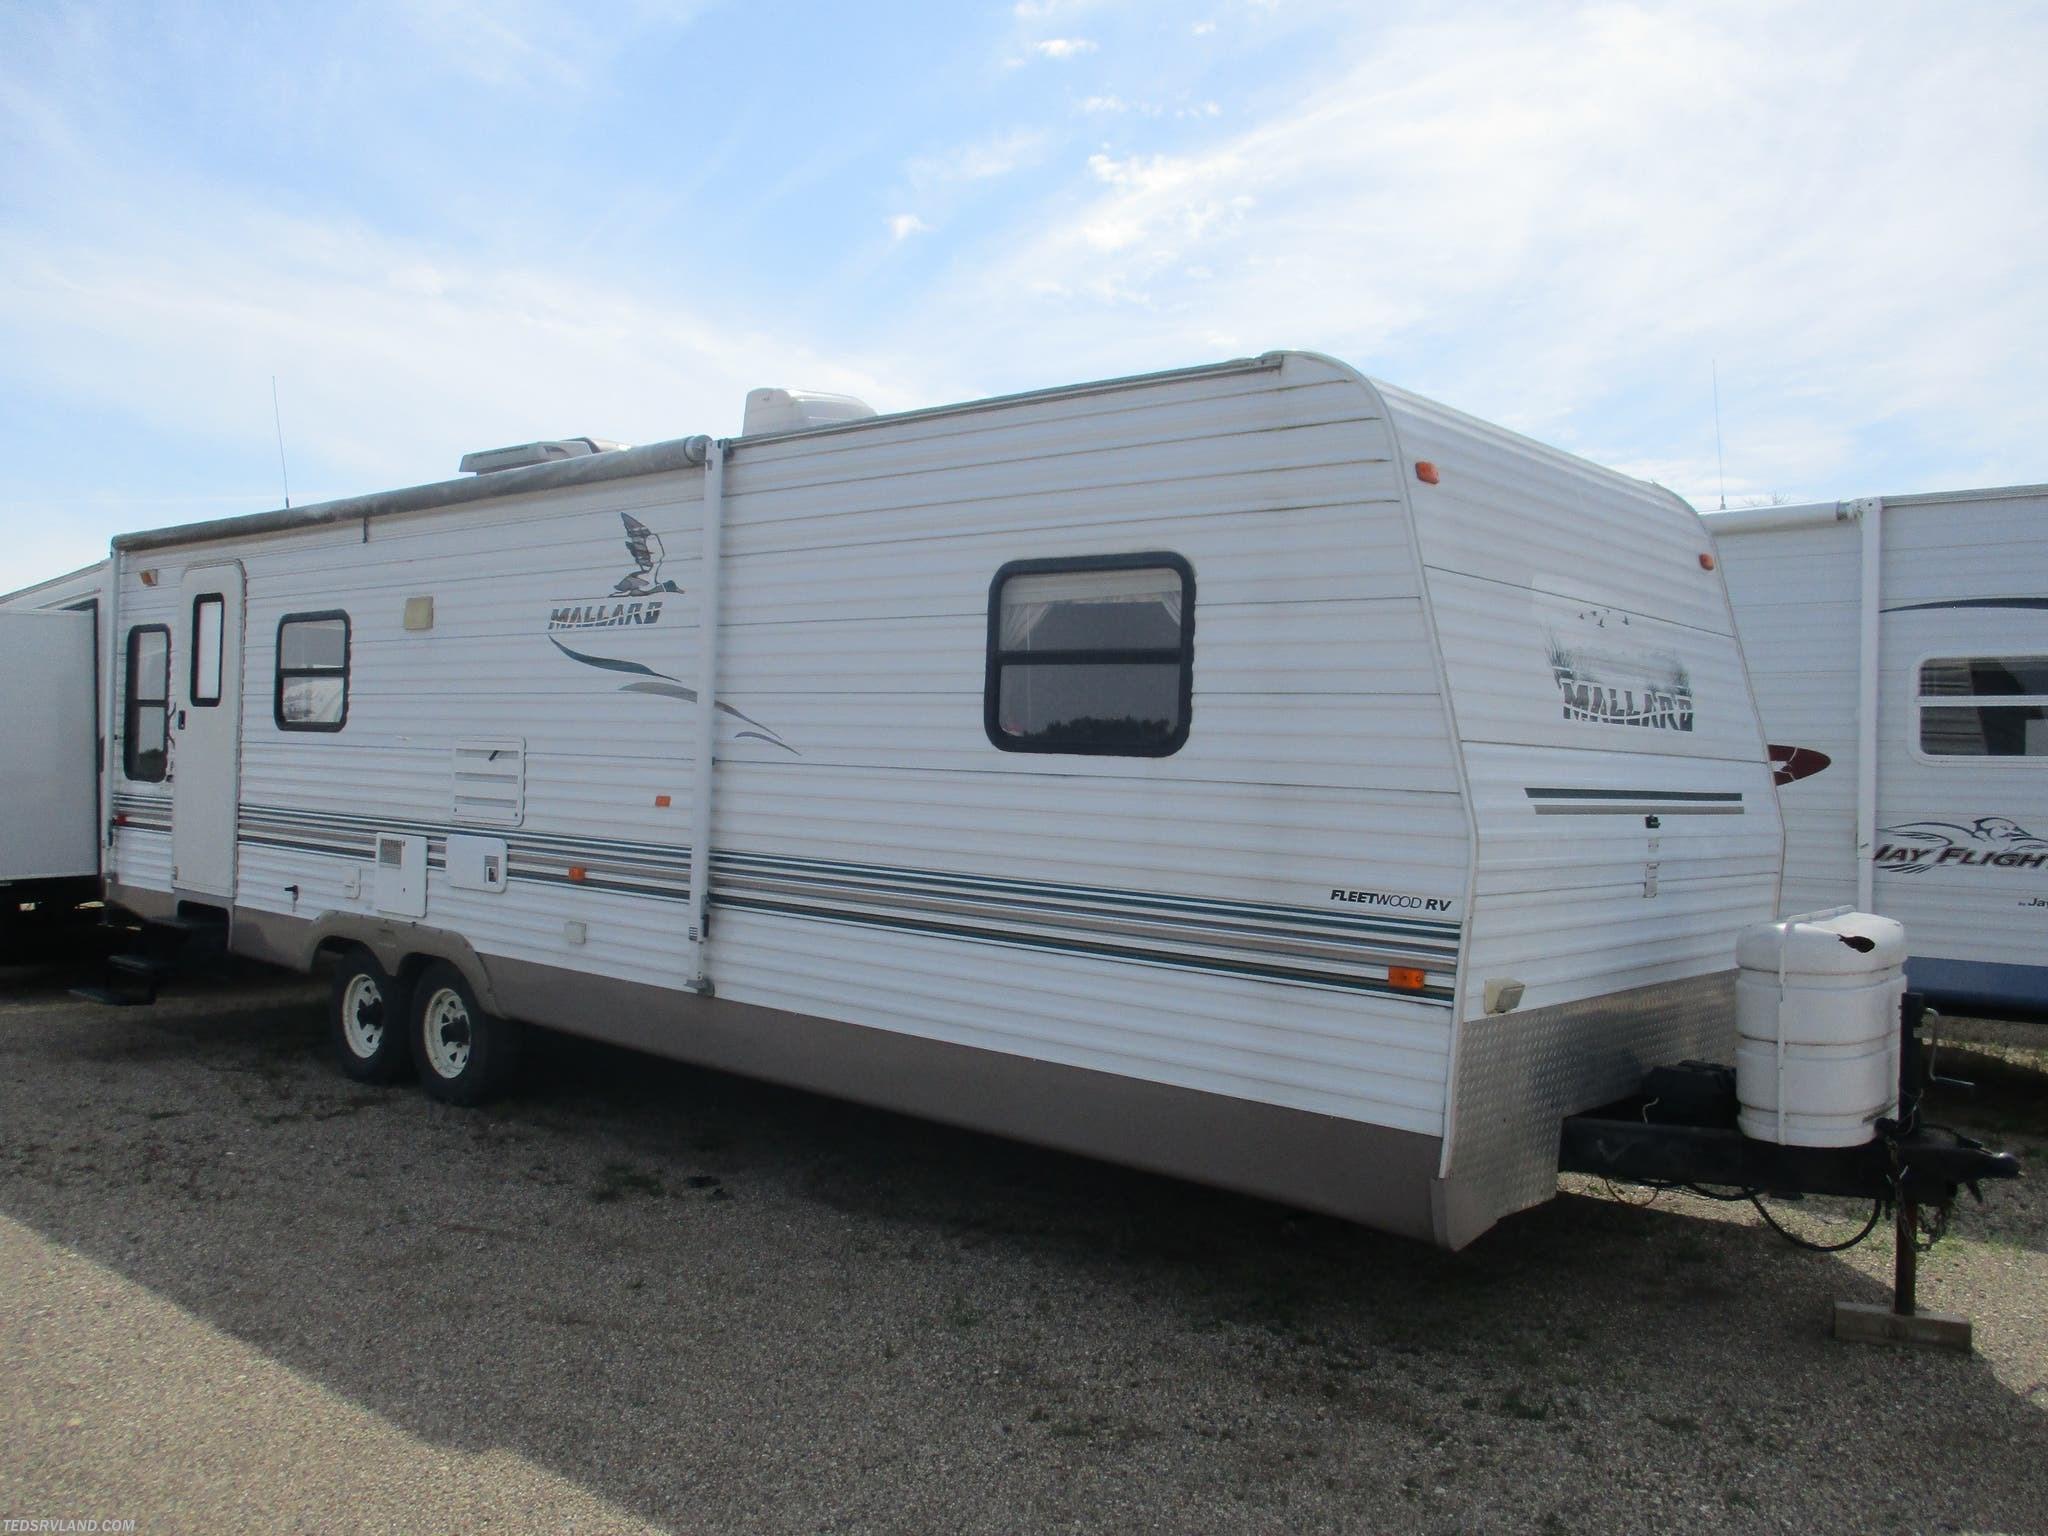 2004 Fleetwood RV Mallard 28RLS for Sale in Paynesville, MN 56362    46006948   RVUSA.com Classifieds